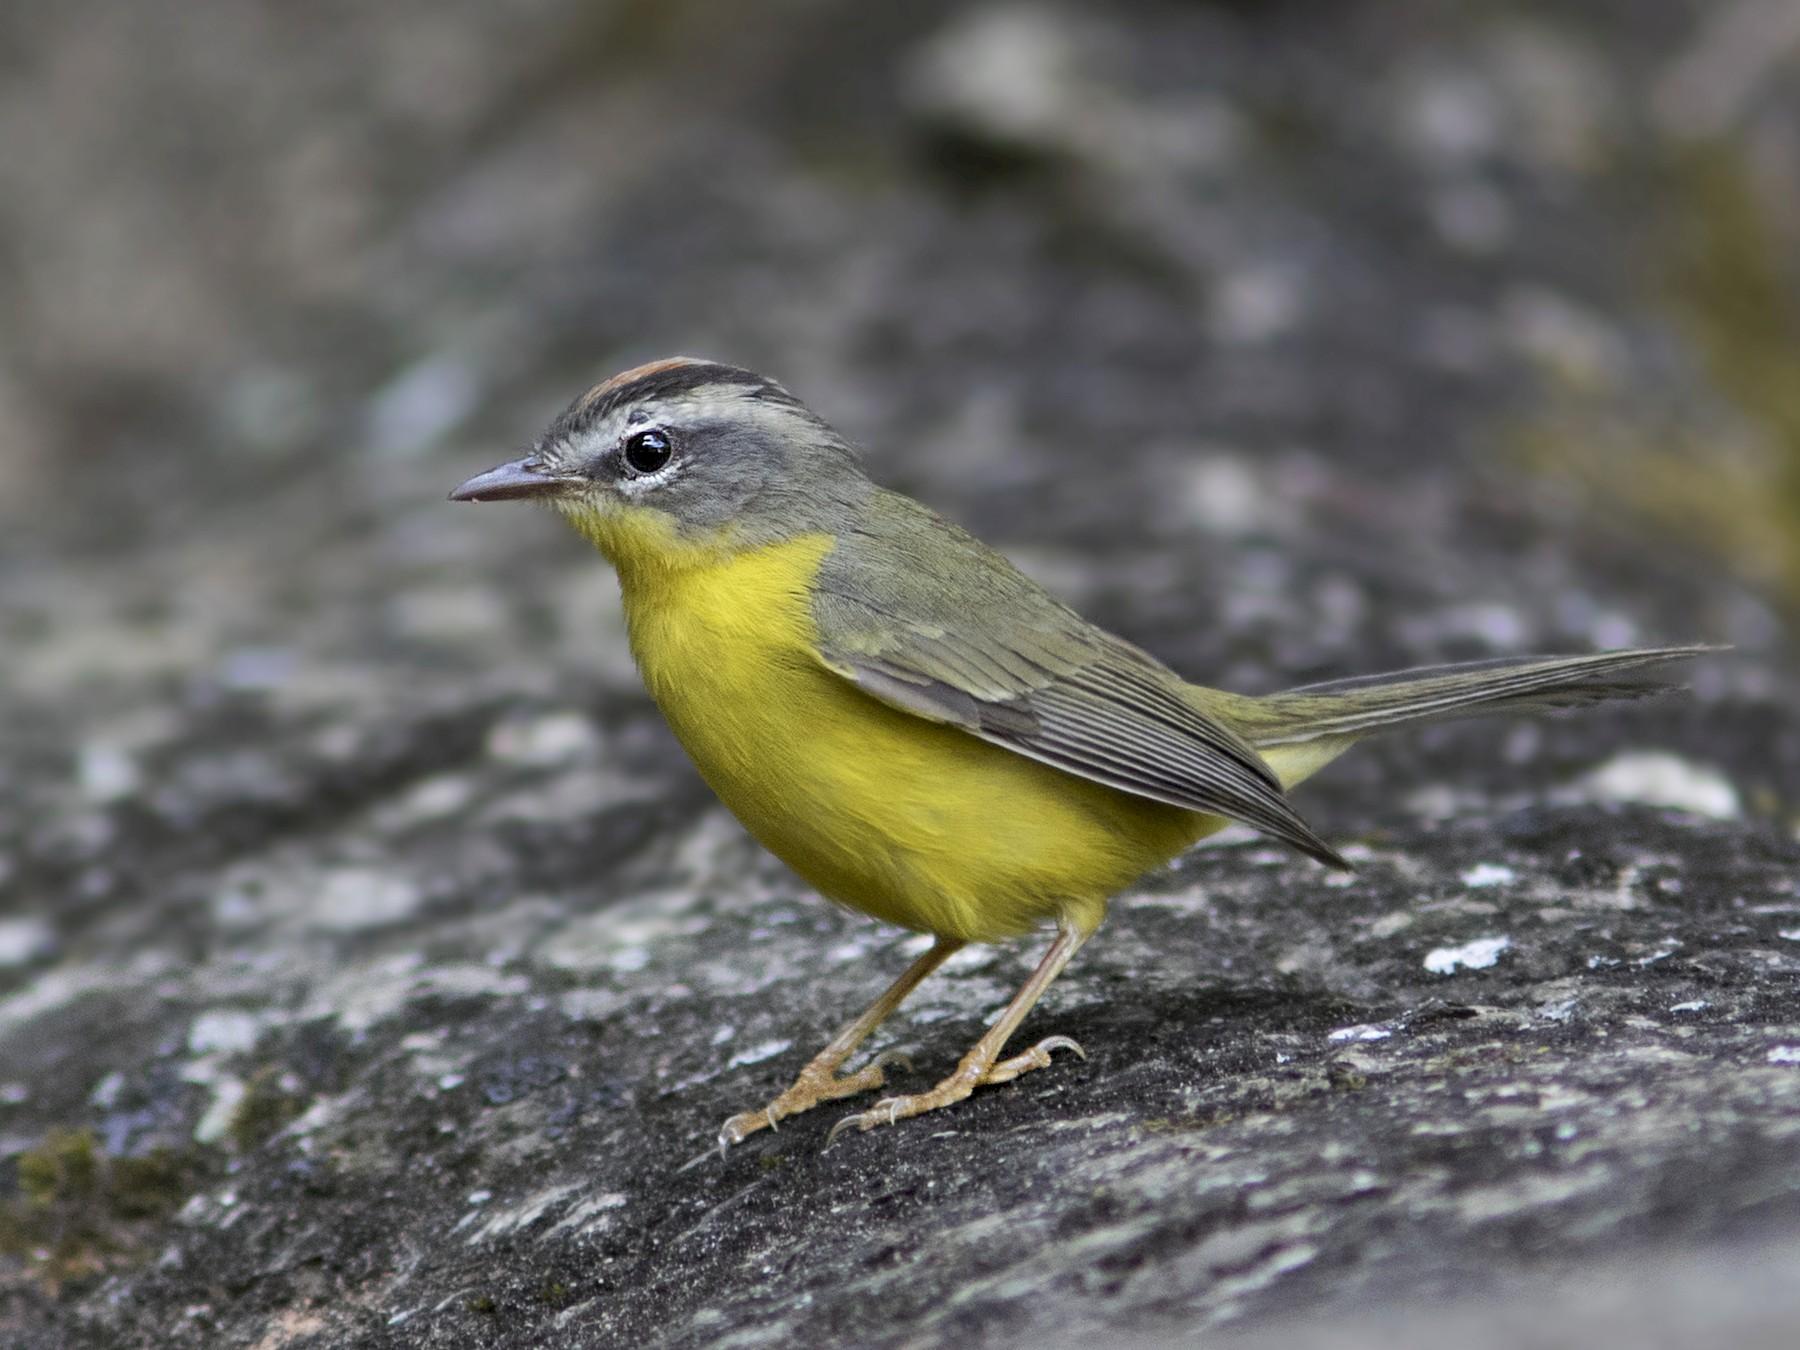 Golden-crowned Warbler - Caio Brito